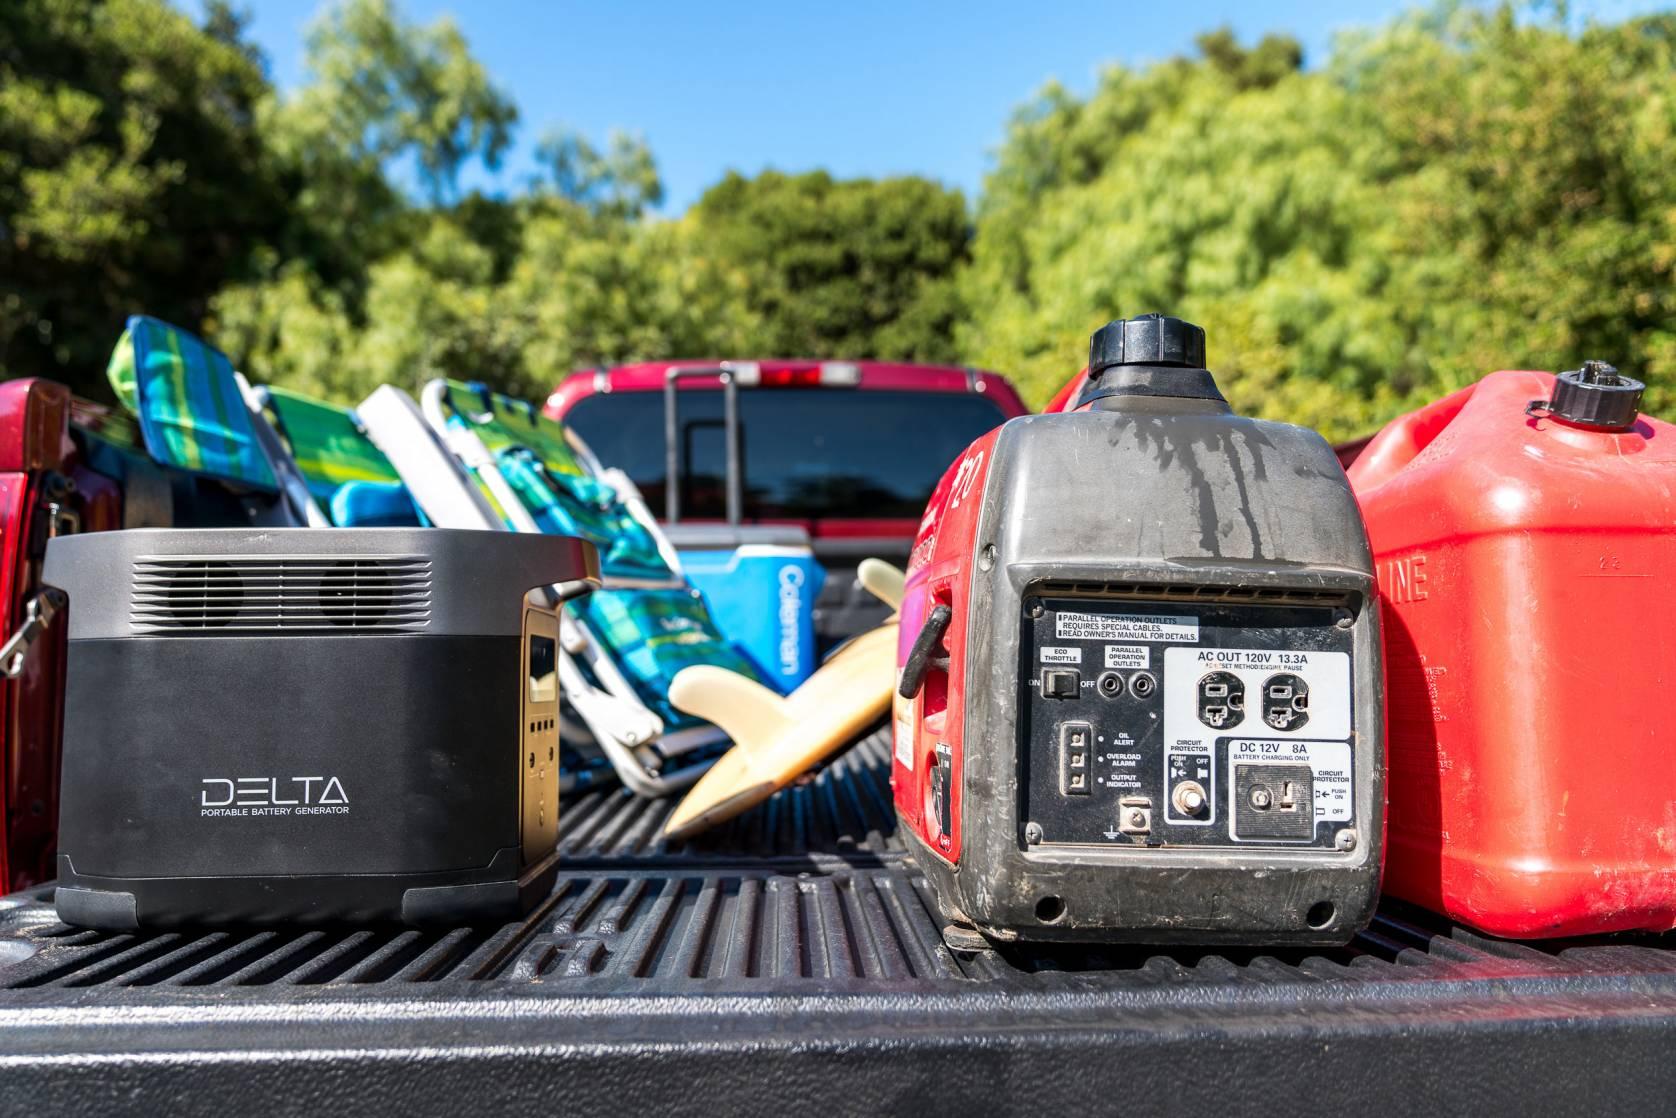 EcoFlow Delta electric generator